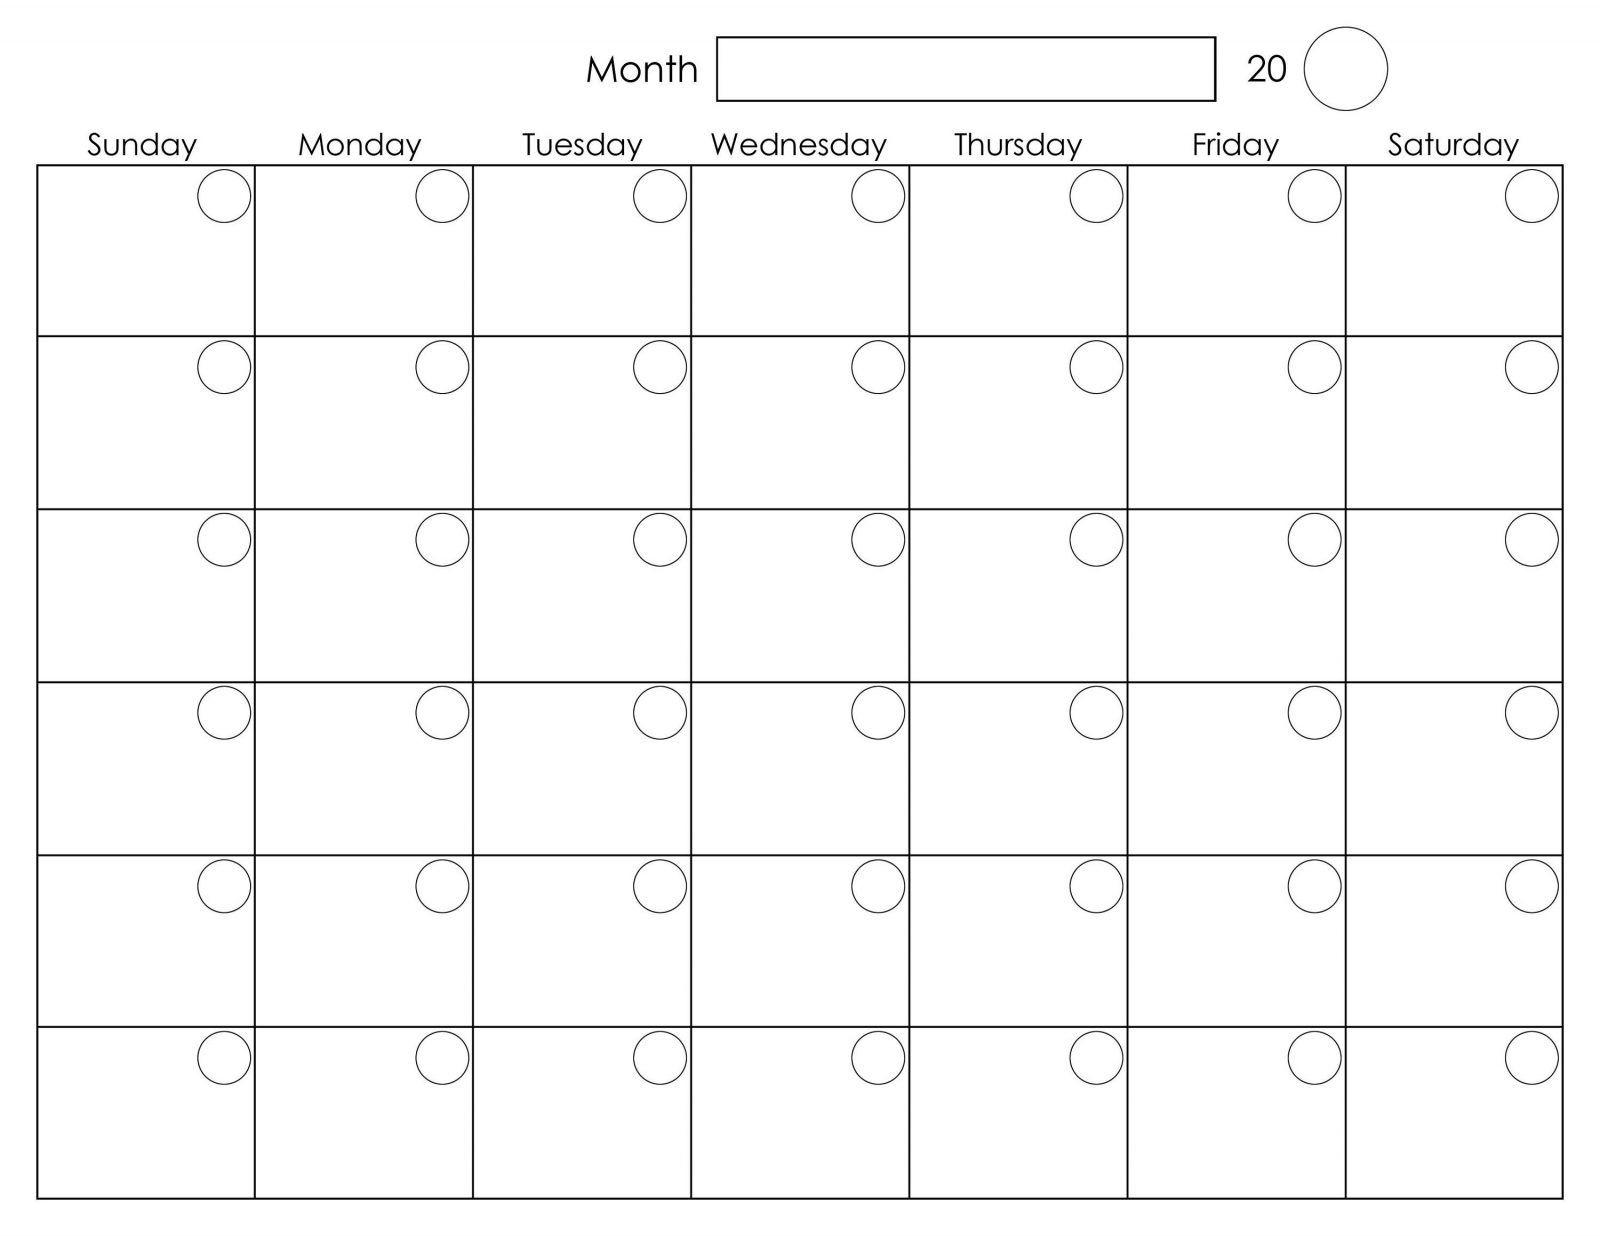 Free Printable 2020 Calendar Template Pdf, Word, Excel, Page